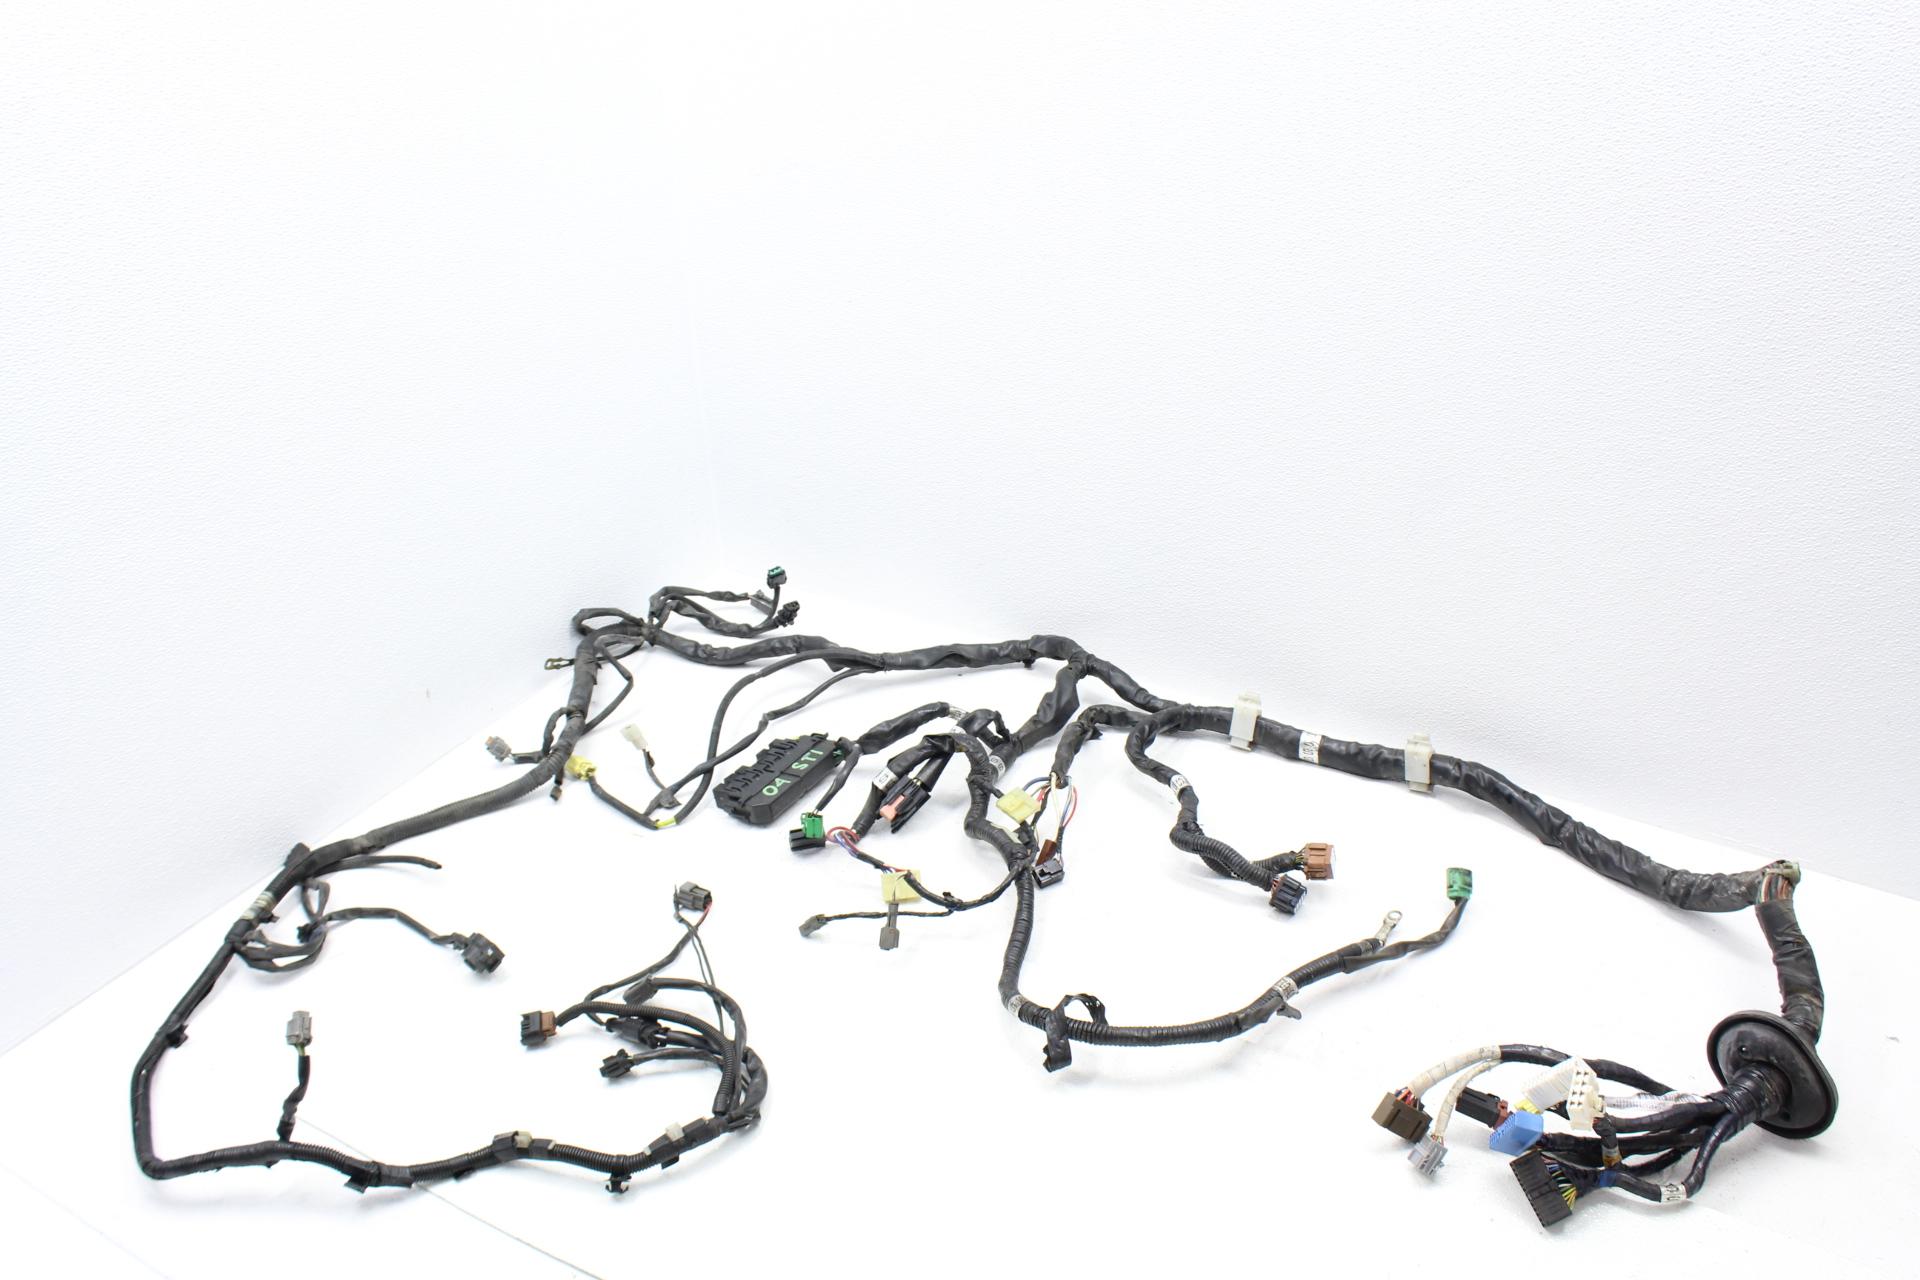 2005 subaru impreza wrx wiring harness 04-05 2004-2005 subaru wrx sti front chassis wire wiring ... #14